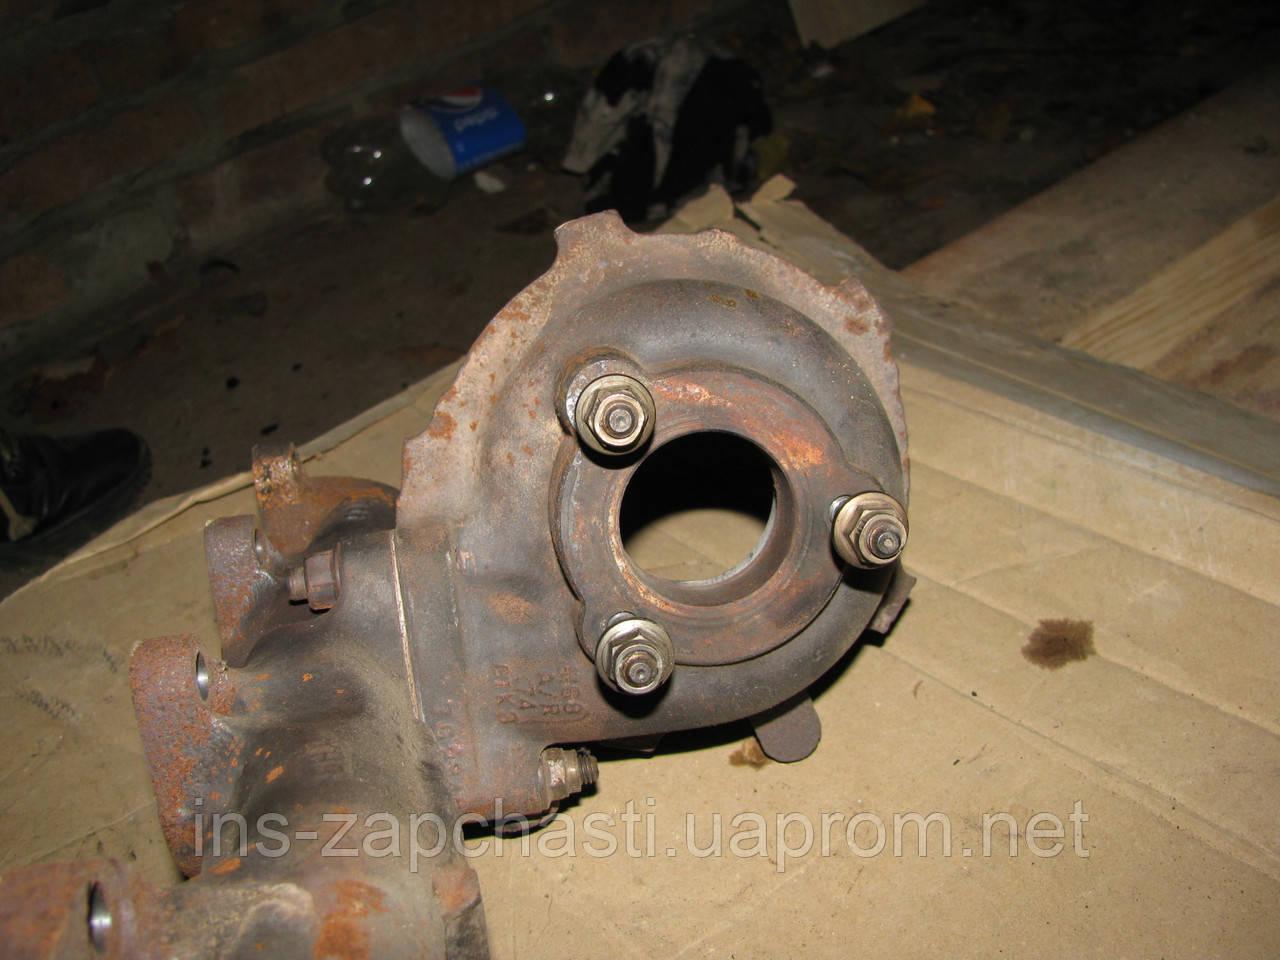 Задня частина турбіни Hyundai i30 2007-2011